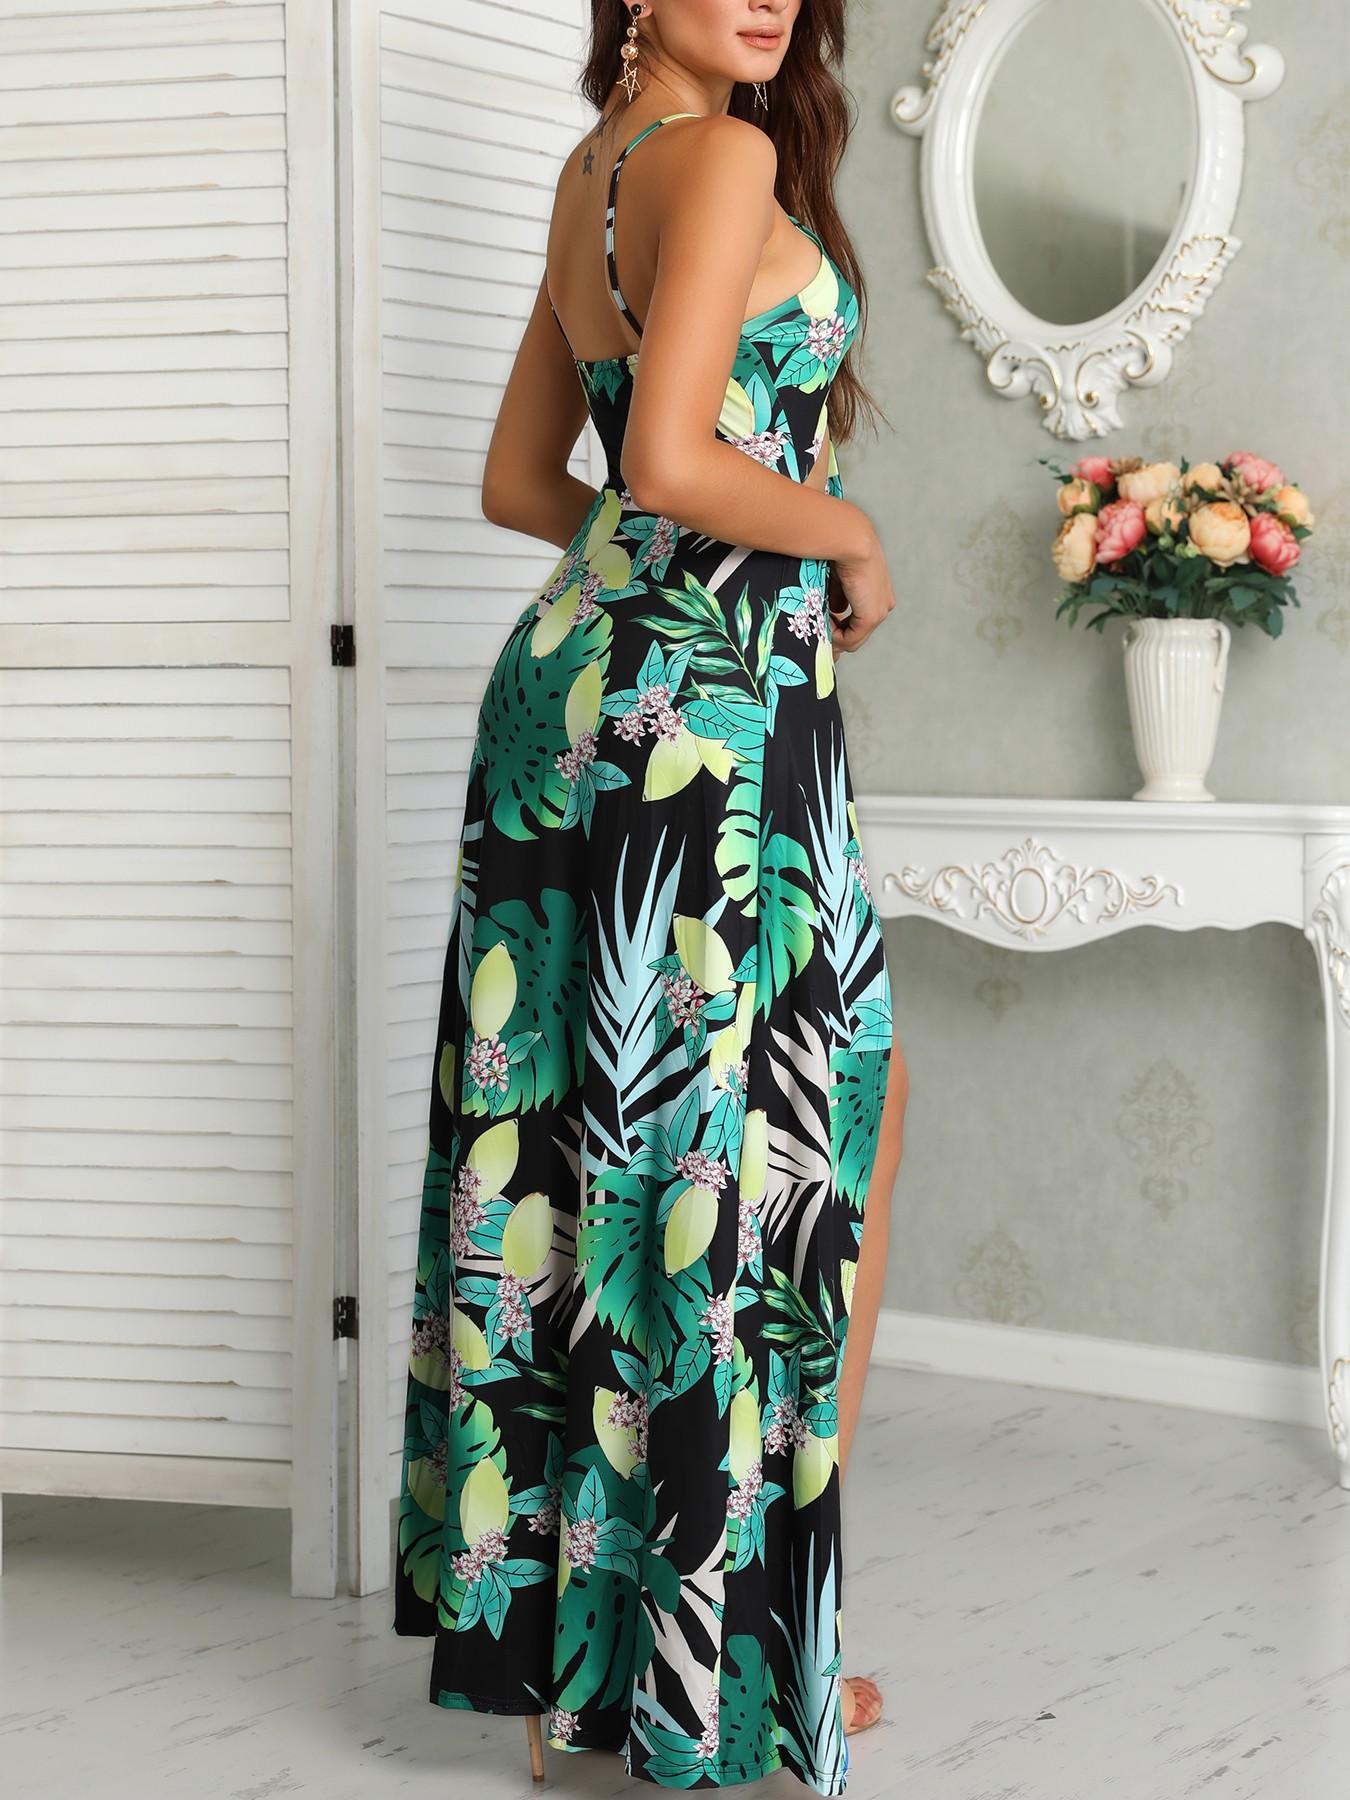 boutiquefeel / Tropical Cutout Knot Front Romper Maxi Dress